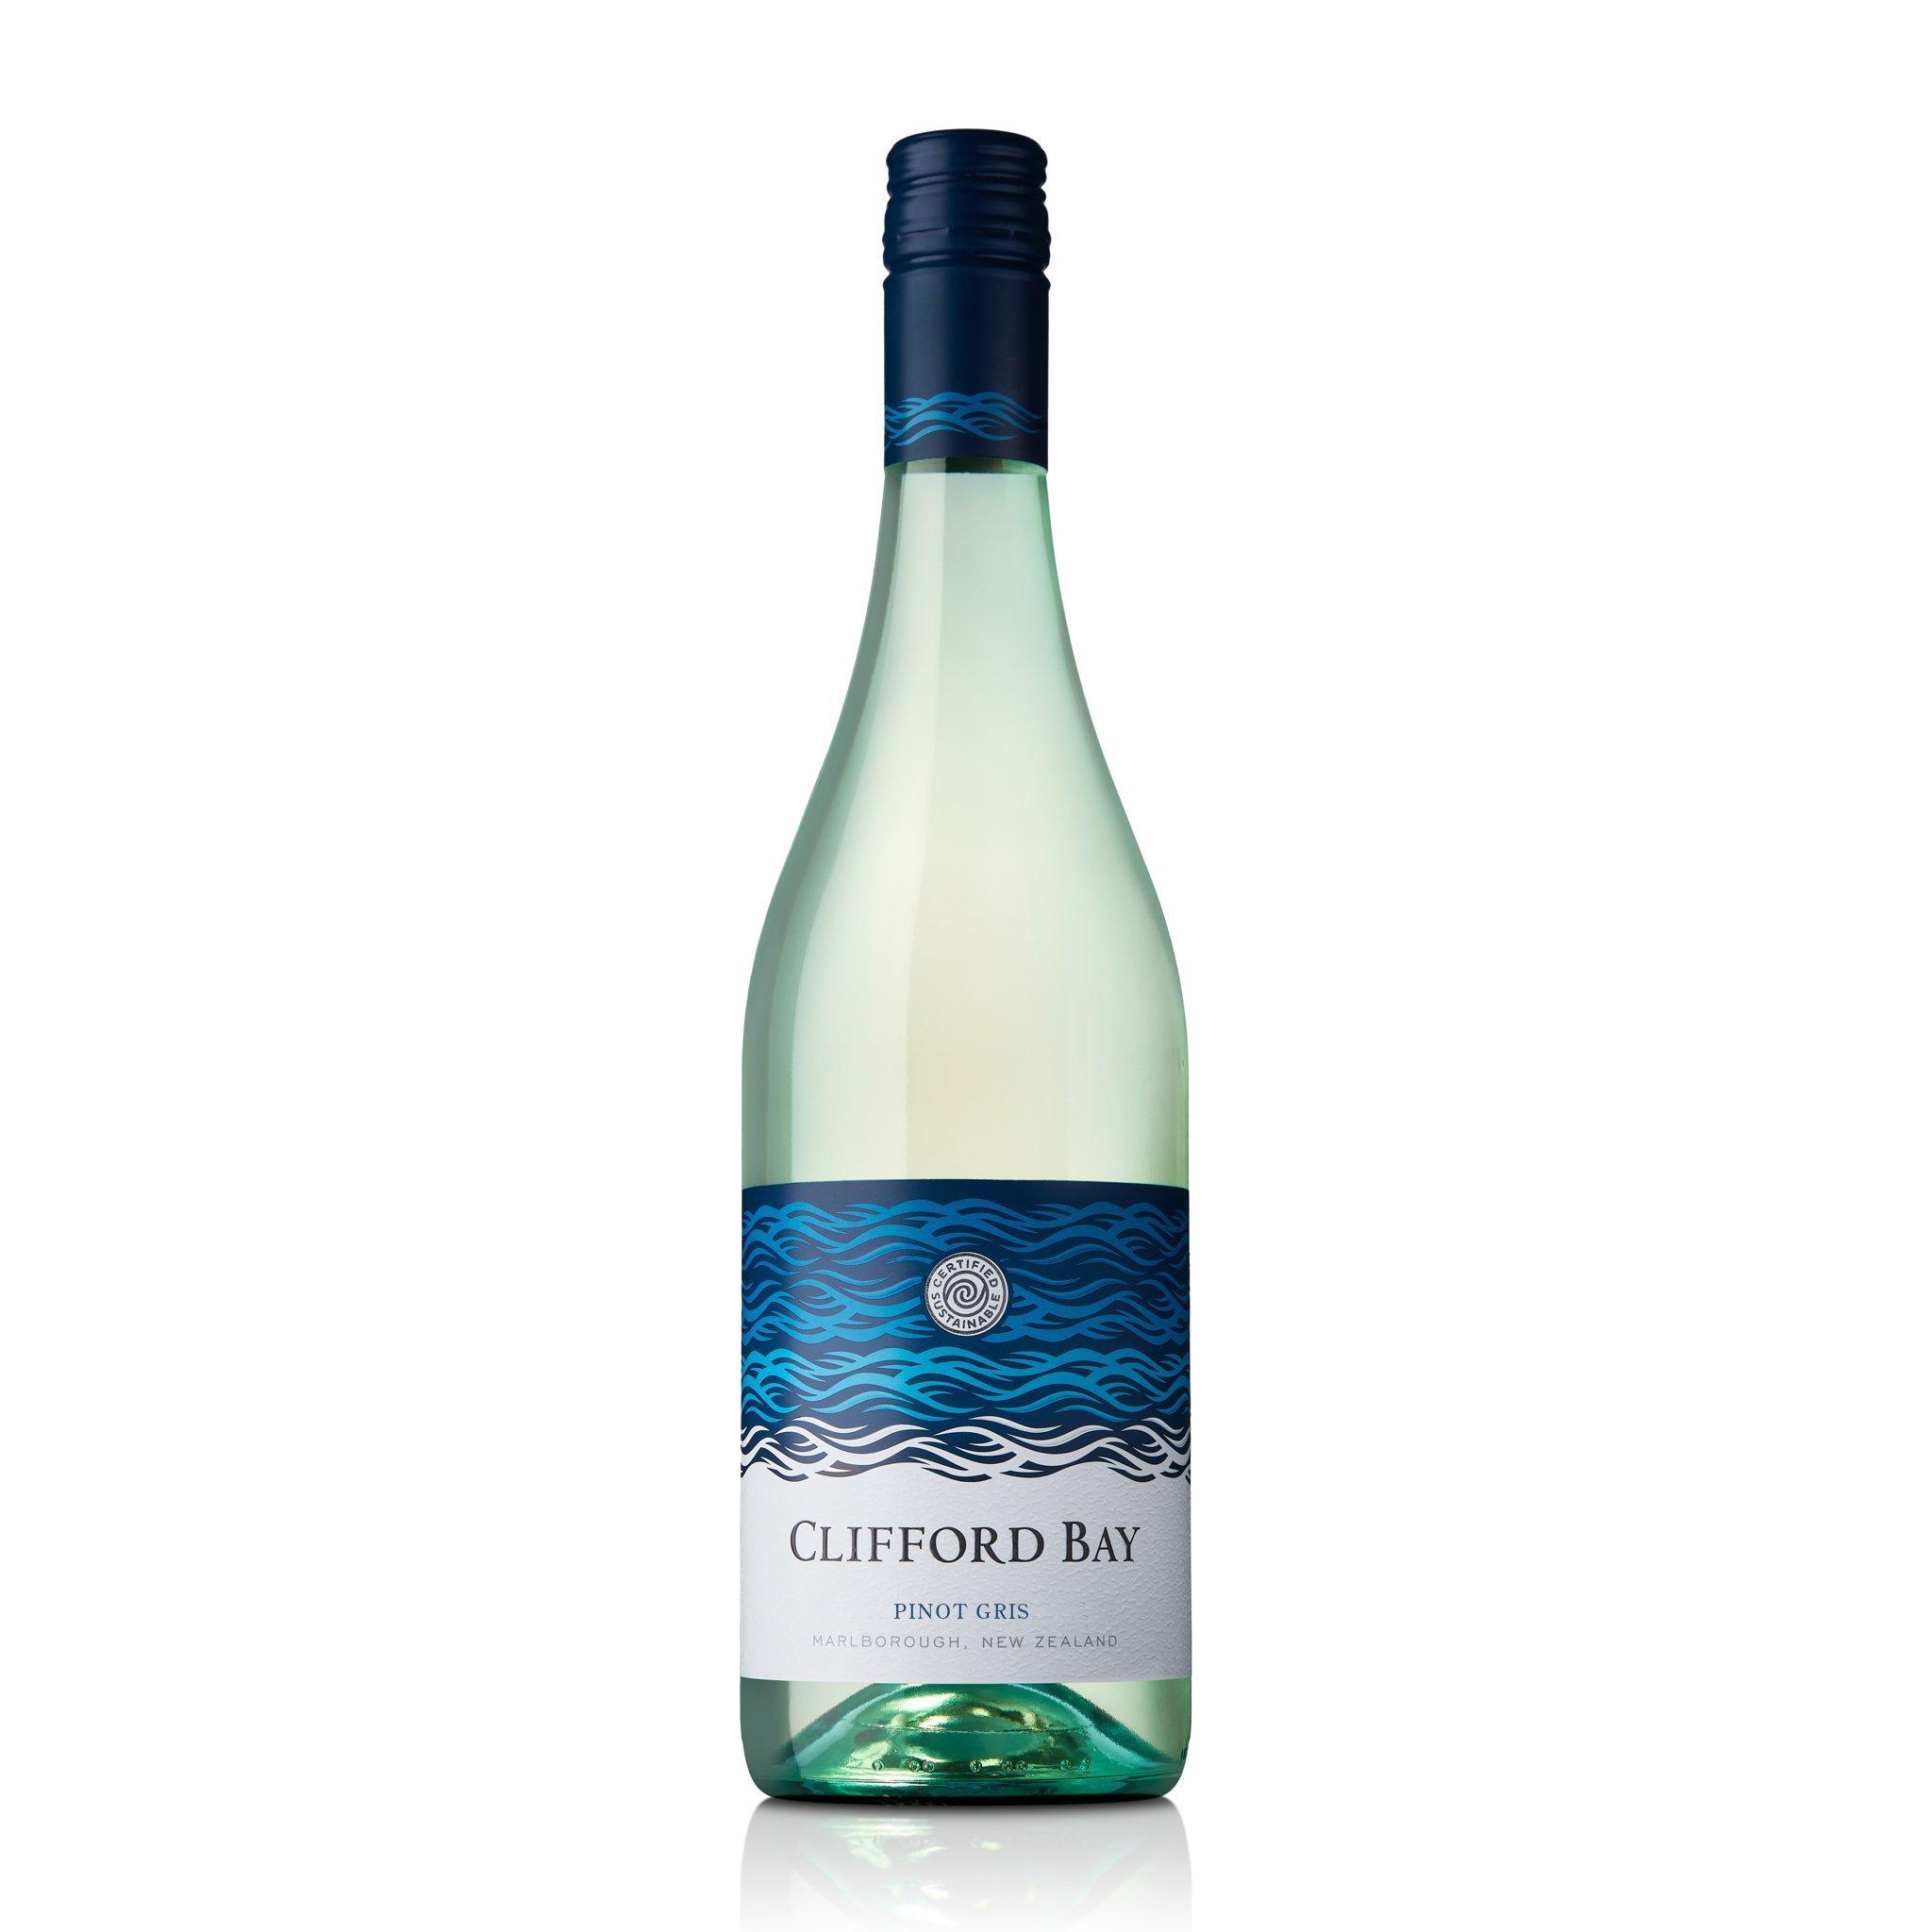 Clifford Bay Pinot Gris 2020 12 bottles